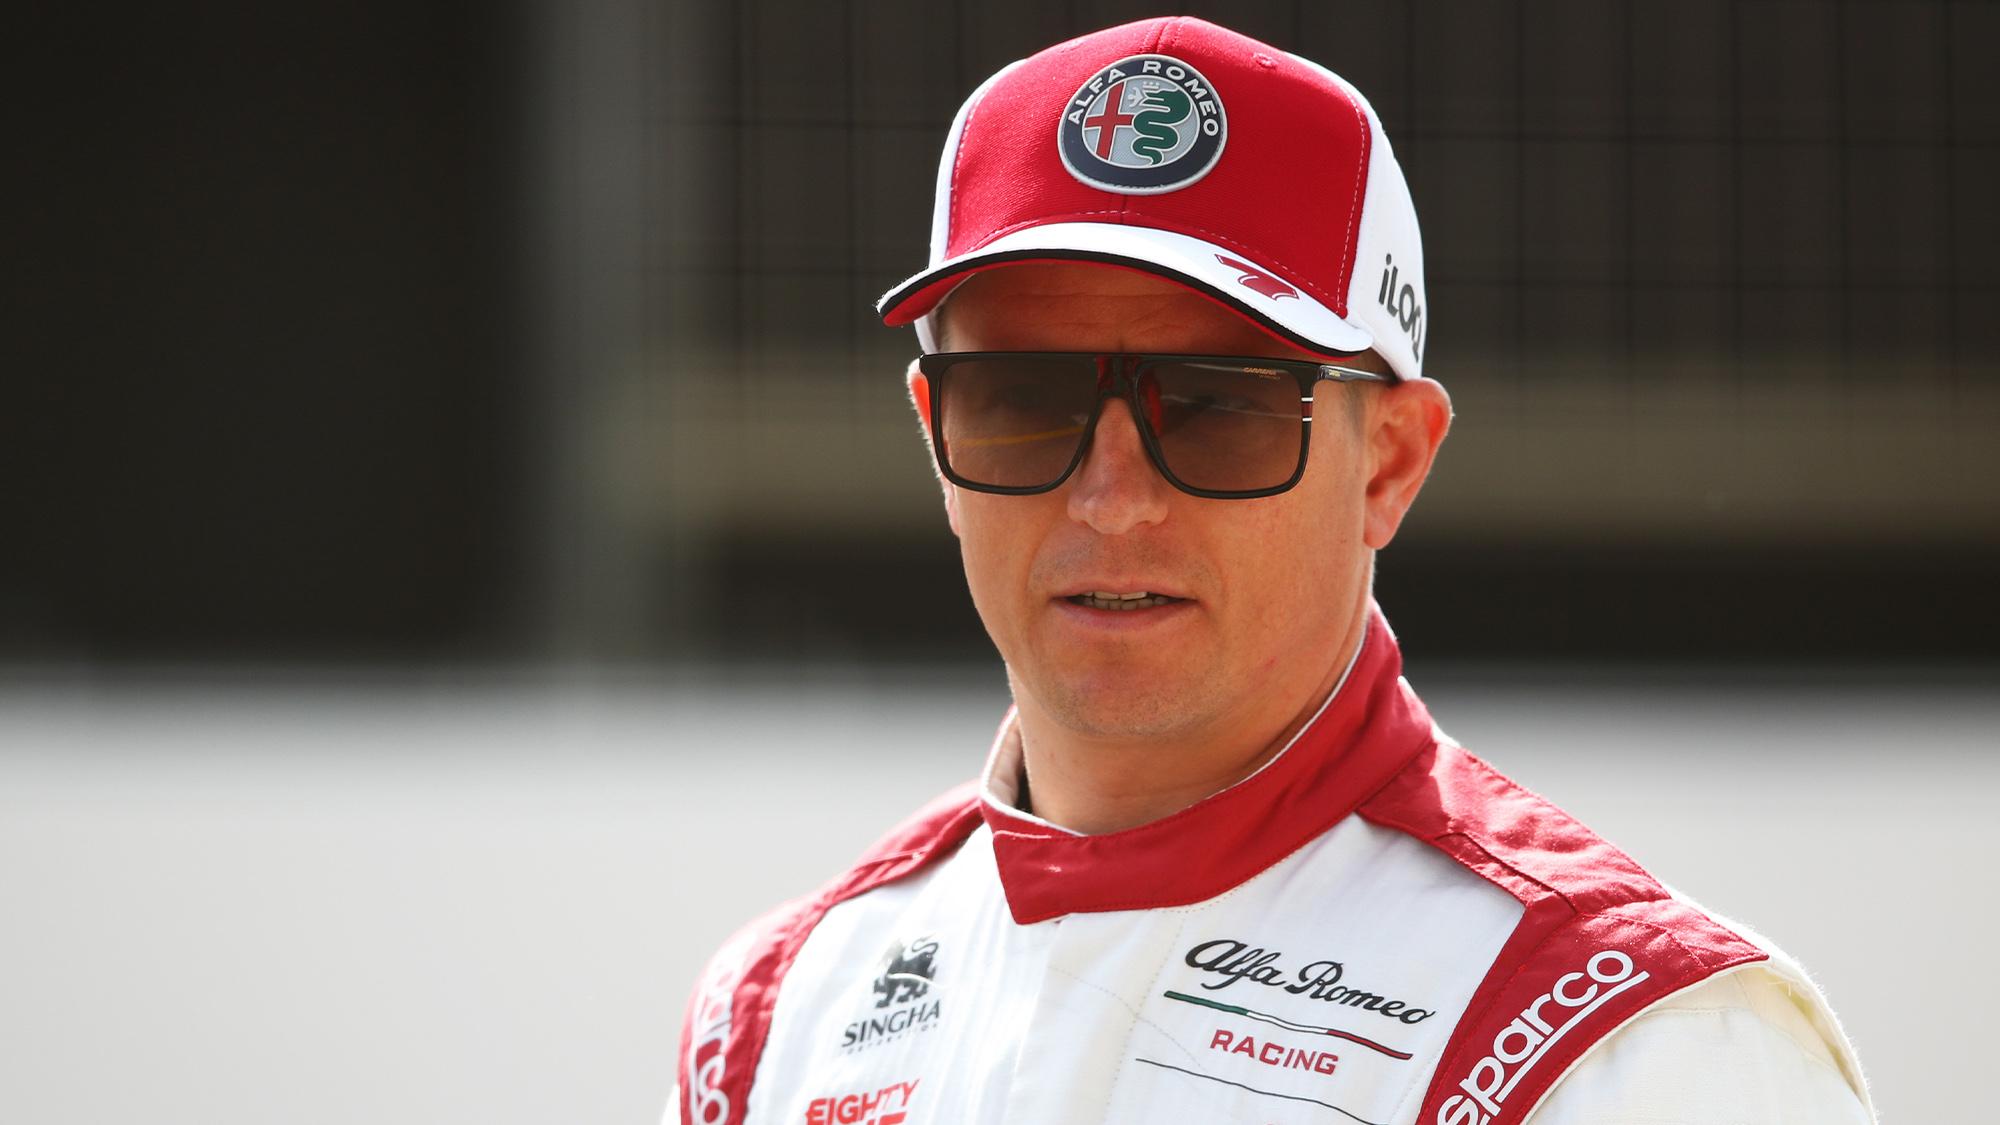 Kimi Raikkonen 2021 portrait